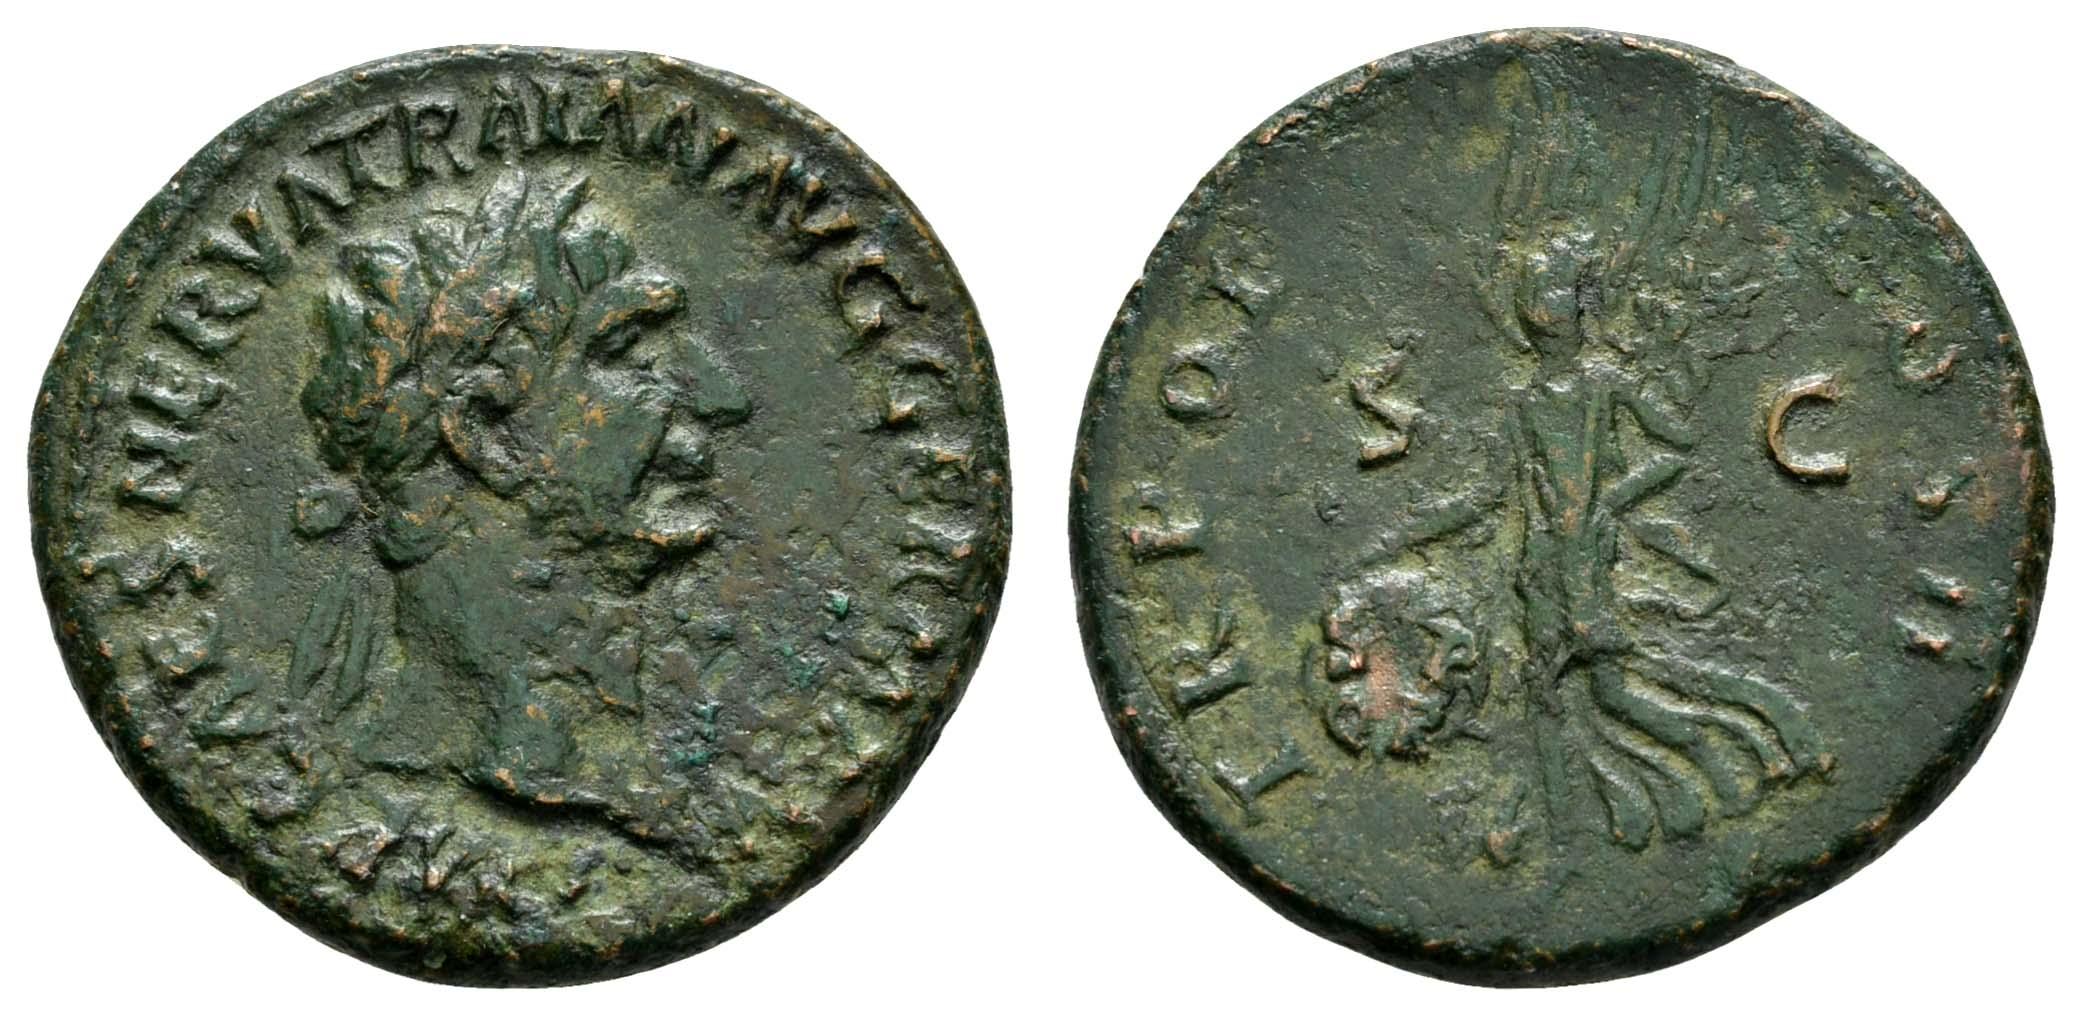 Lot 156 - Antike Römer - Kaiserzeit -  Auktionshaus Ulrich Felzmann GmbH & Co. KG Coins single lots